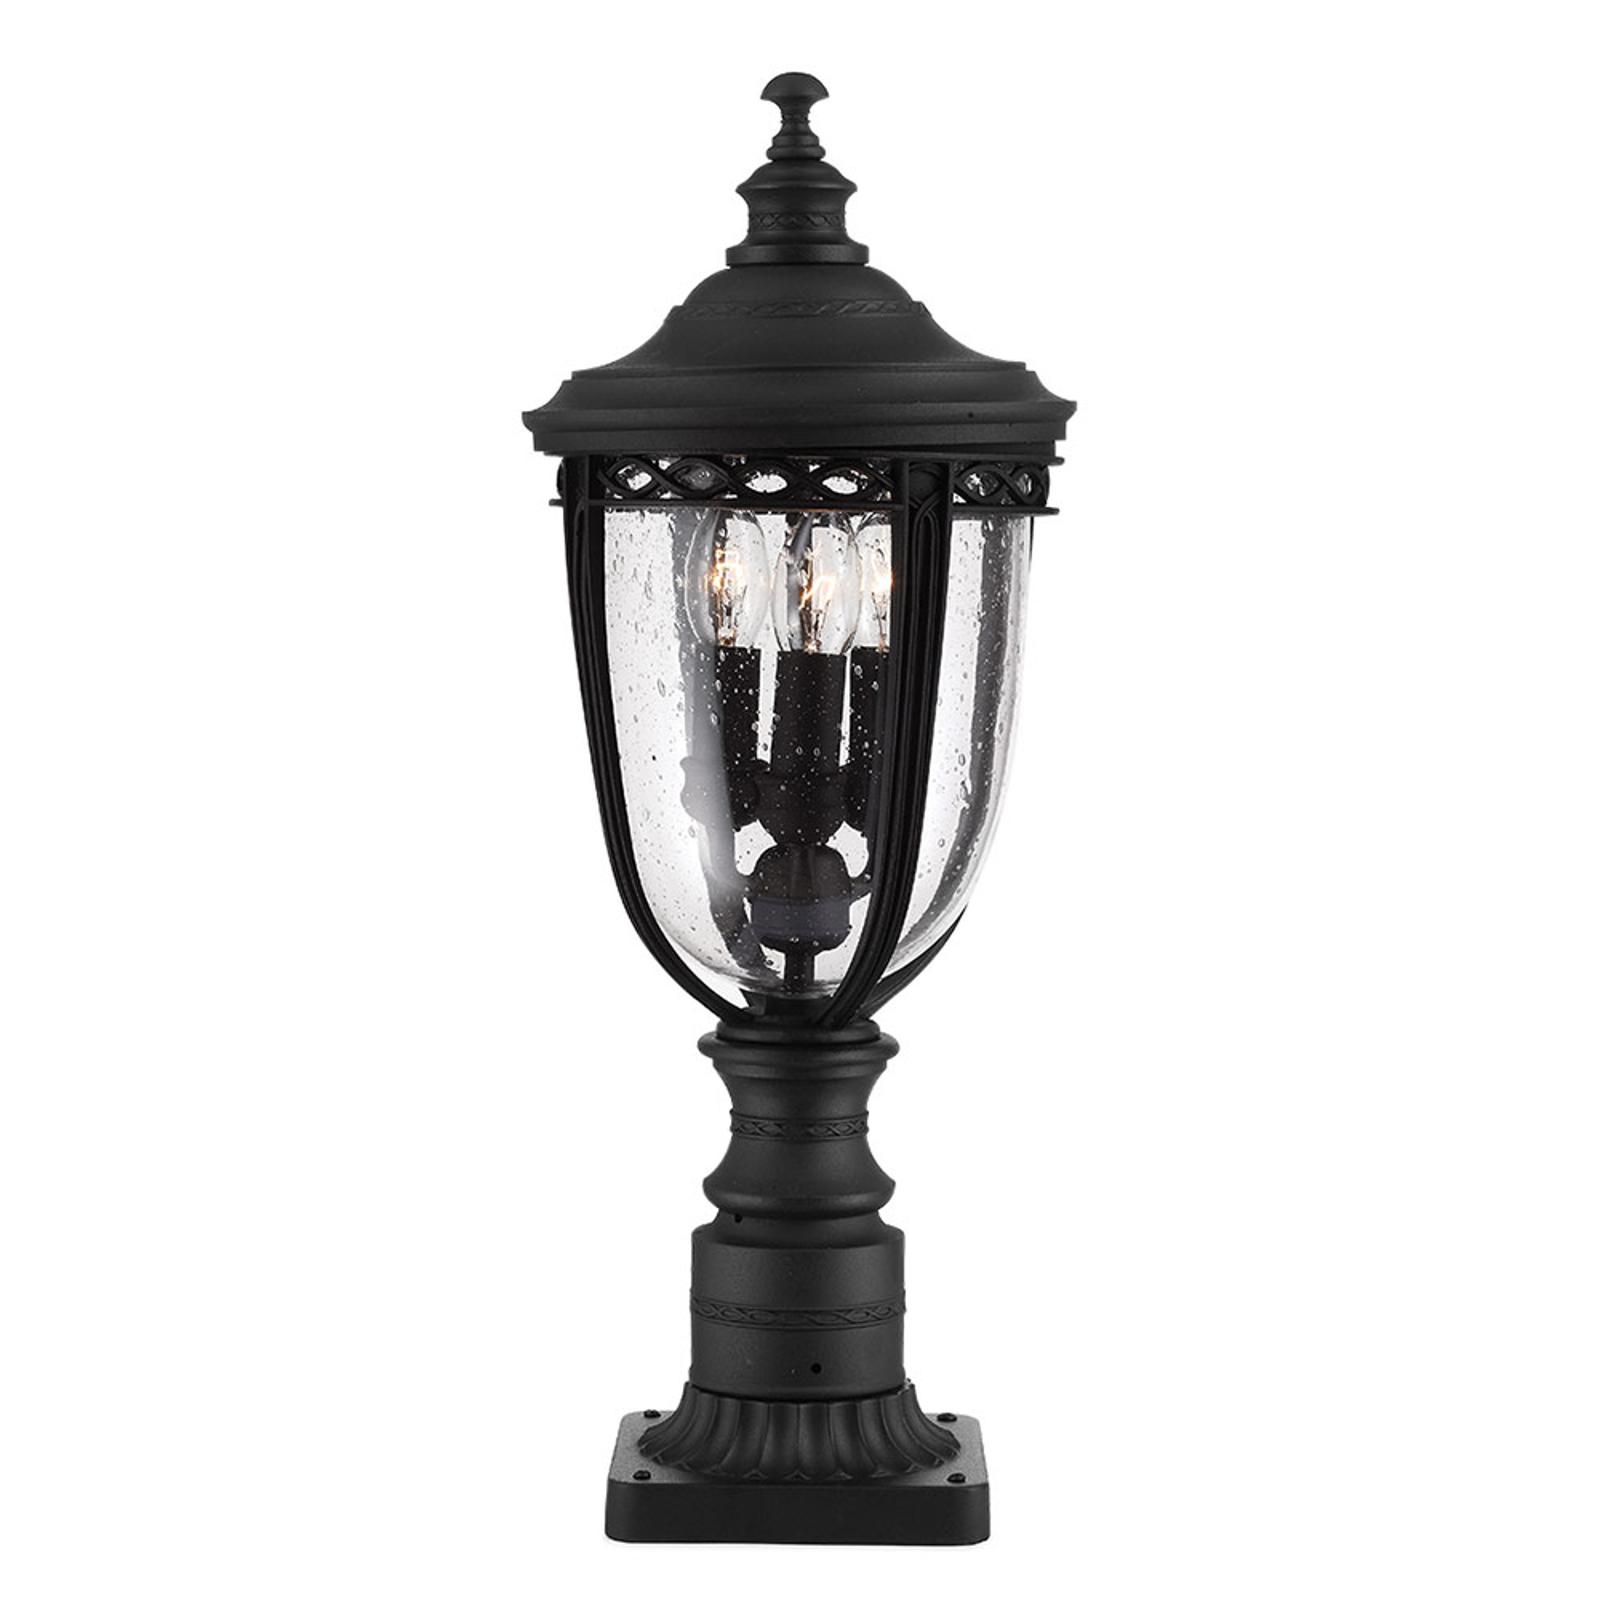 Sokkellamp English Bridle, zwart